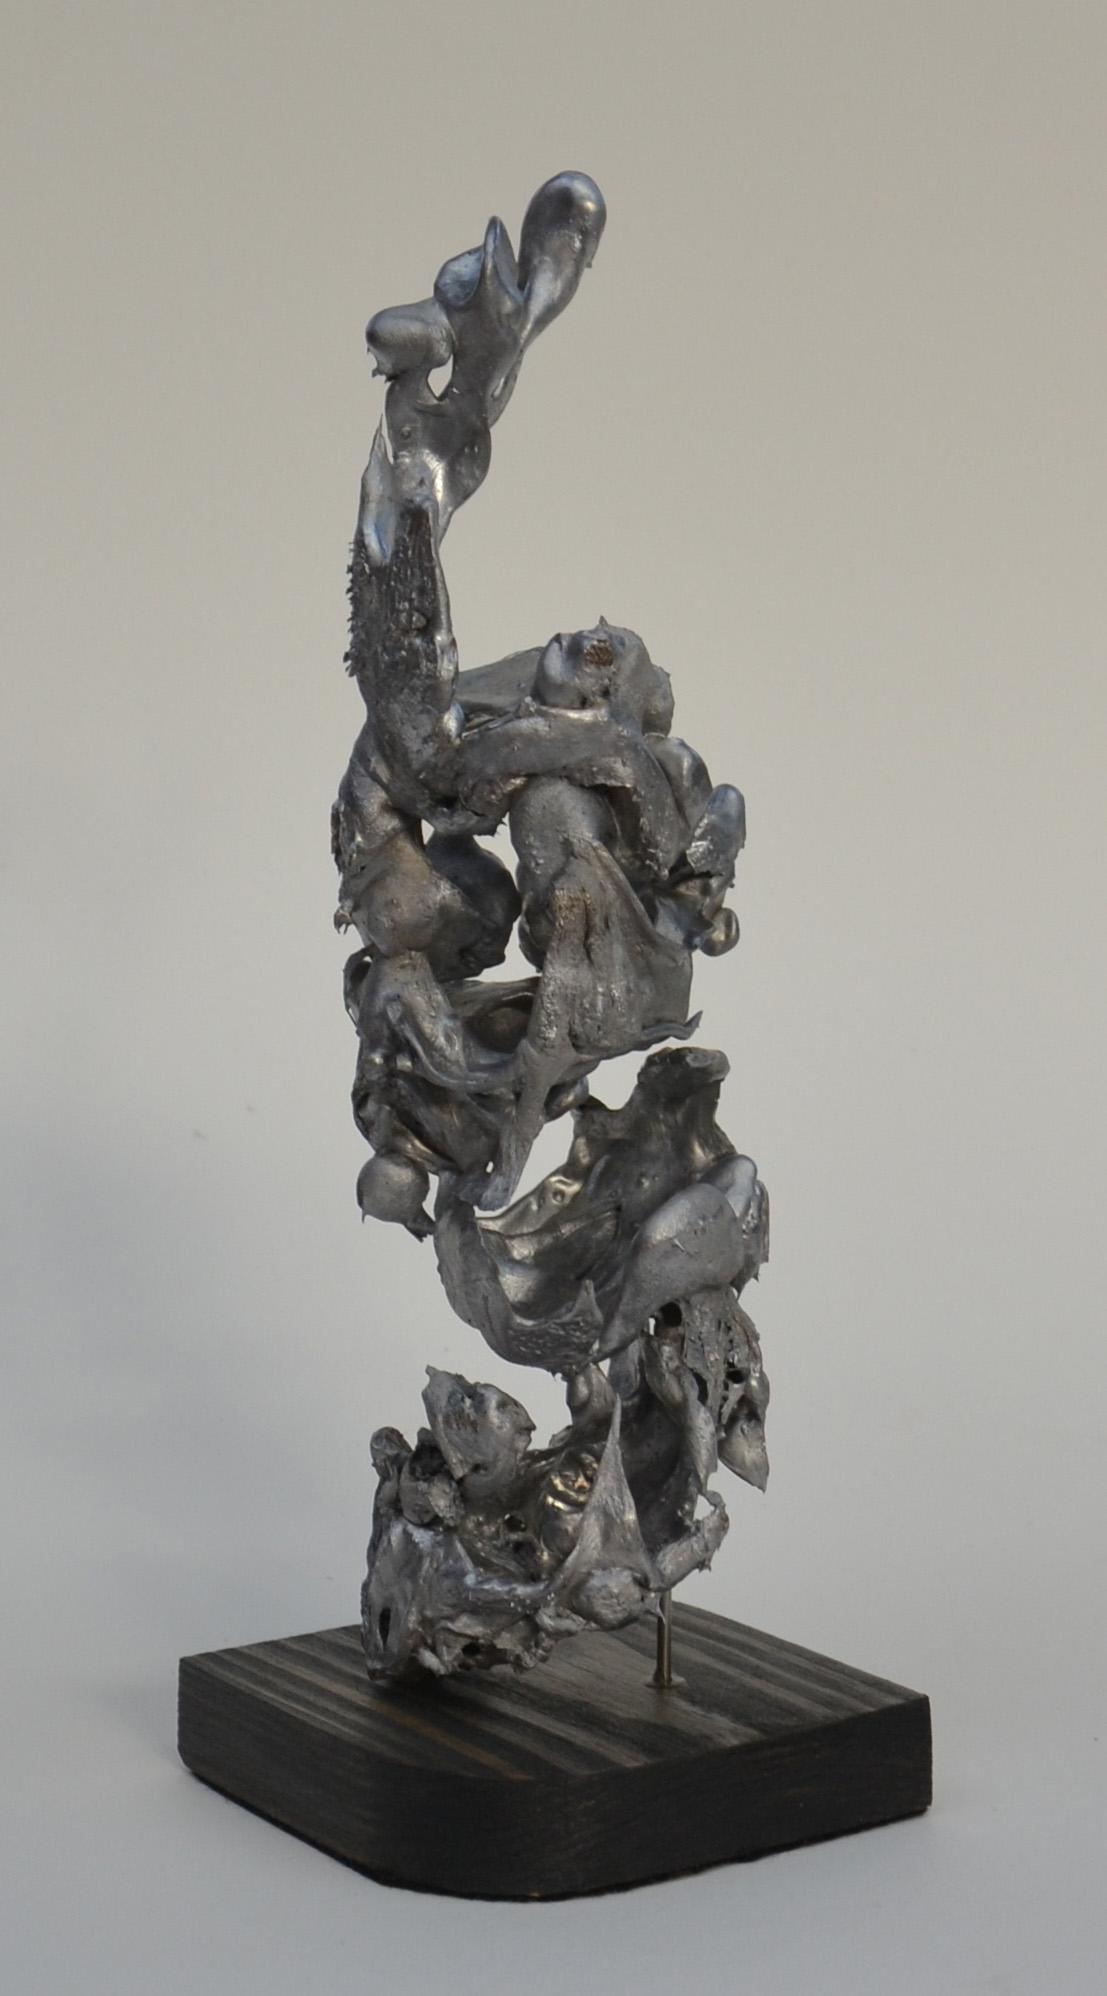 Abstract aluminium casting